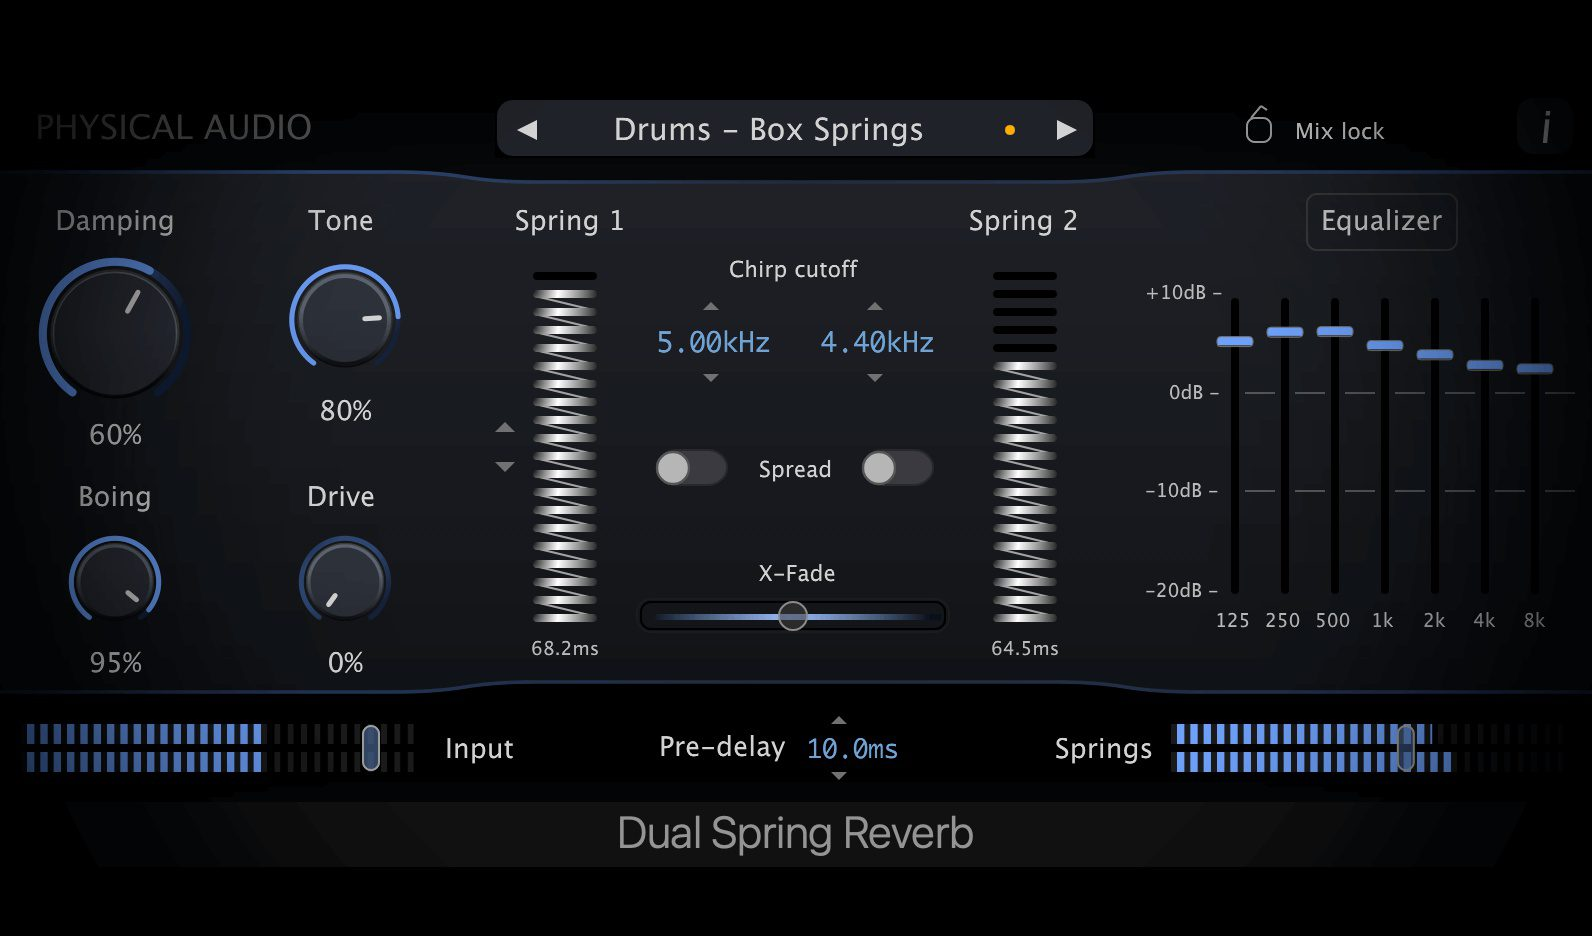 Dual Spring reverb